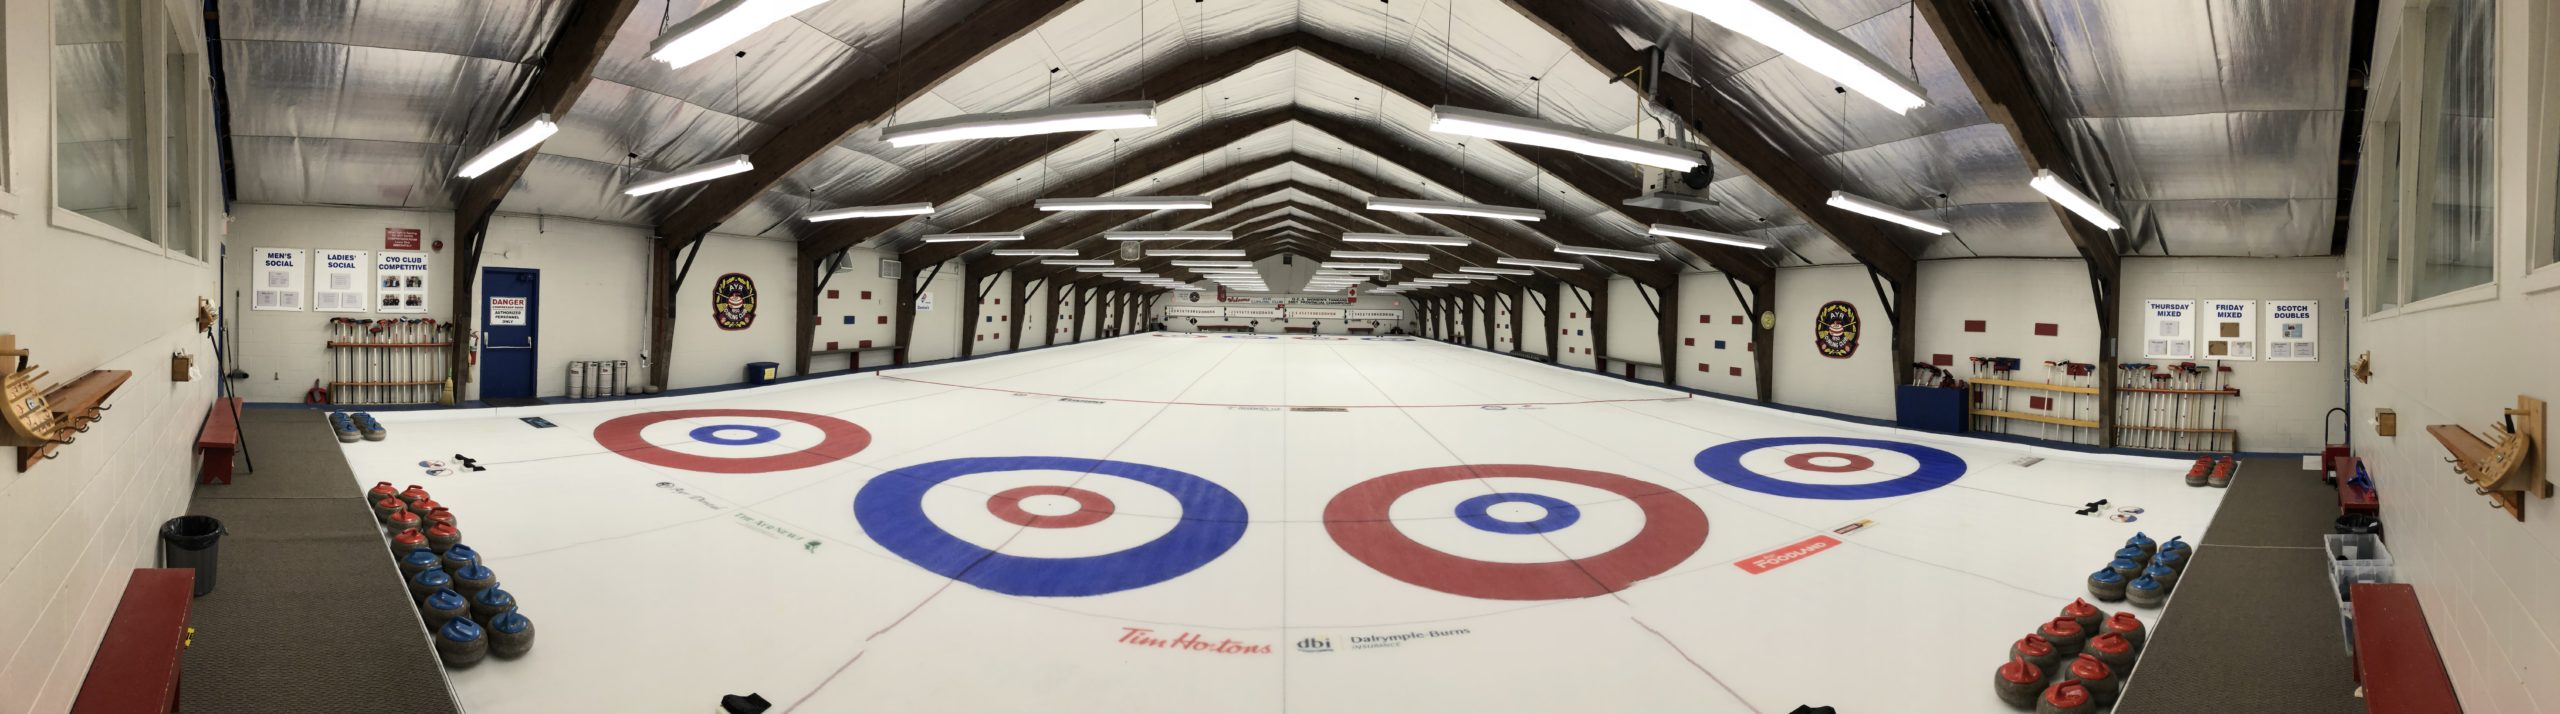 Ayr Curling Club Spring Silent Auction 2021